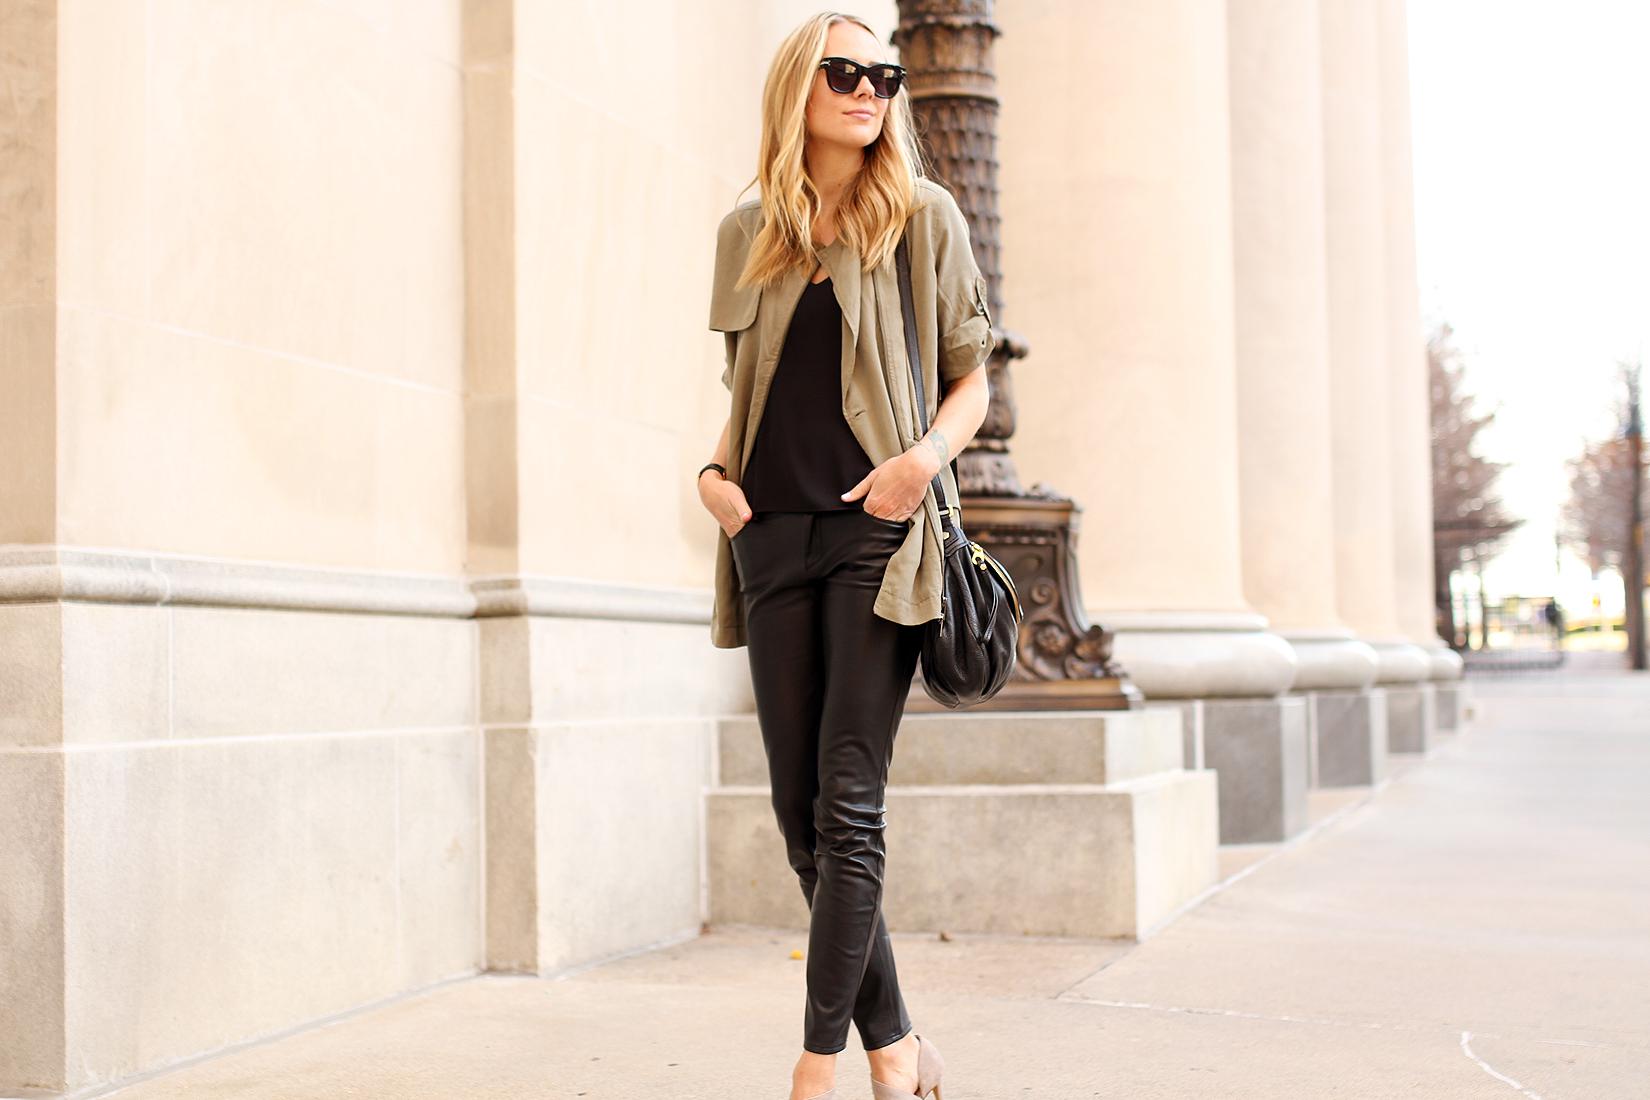 fashion-jackson-banana-republic-drapey-drawstring-jacket-black-faux-leather-pants-celine-sunglasses